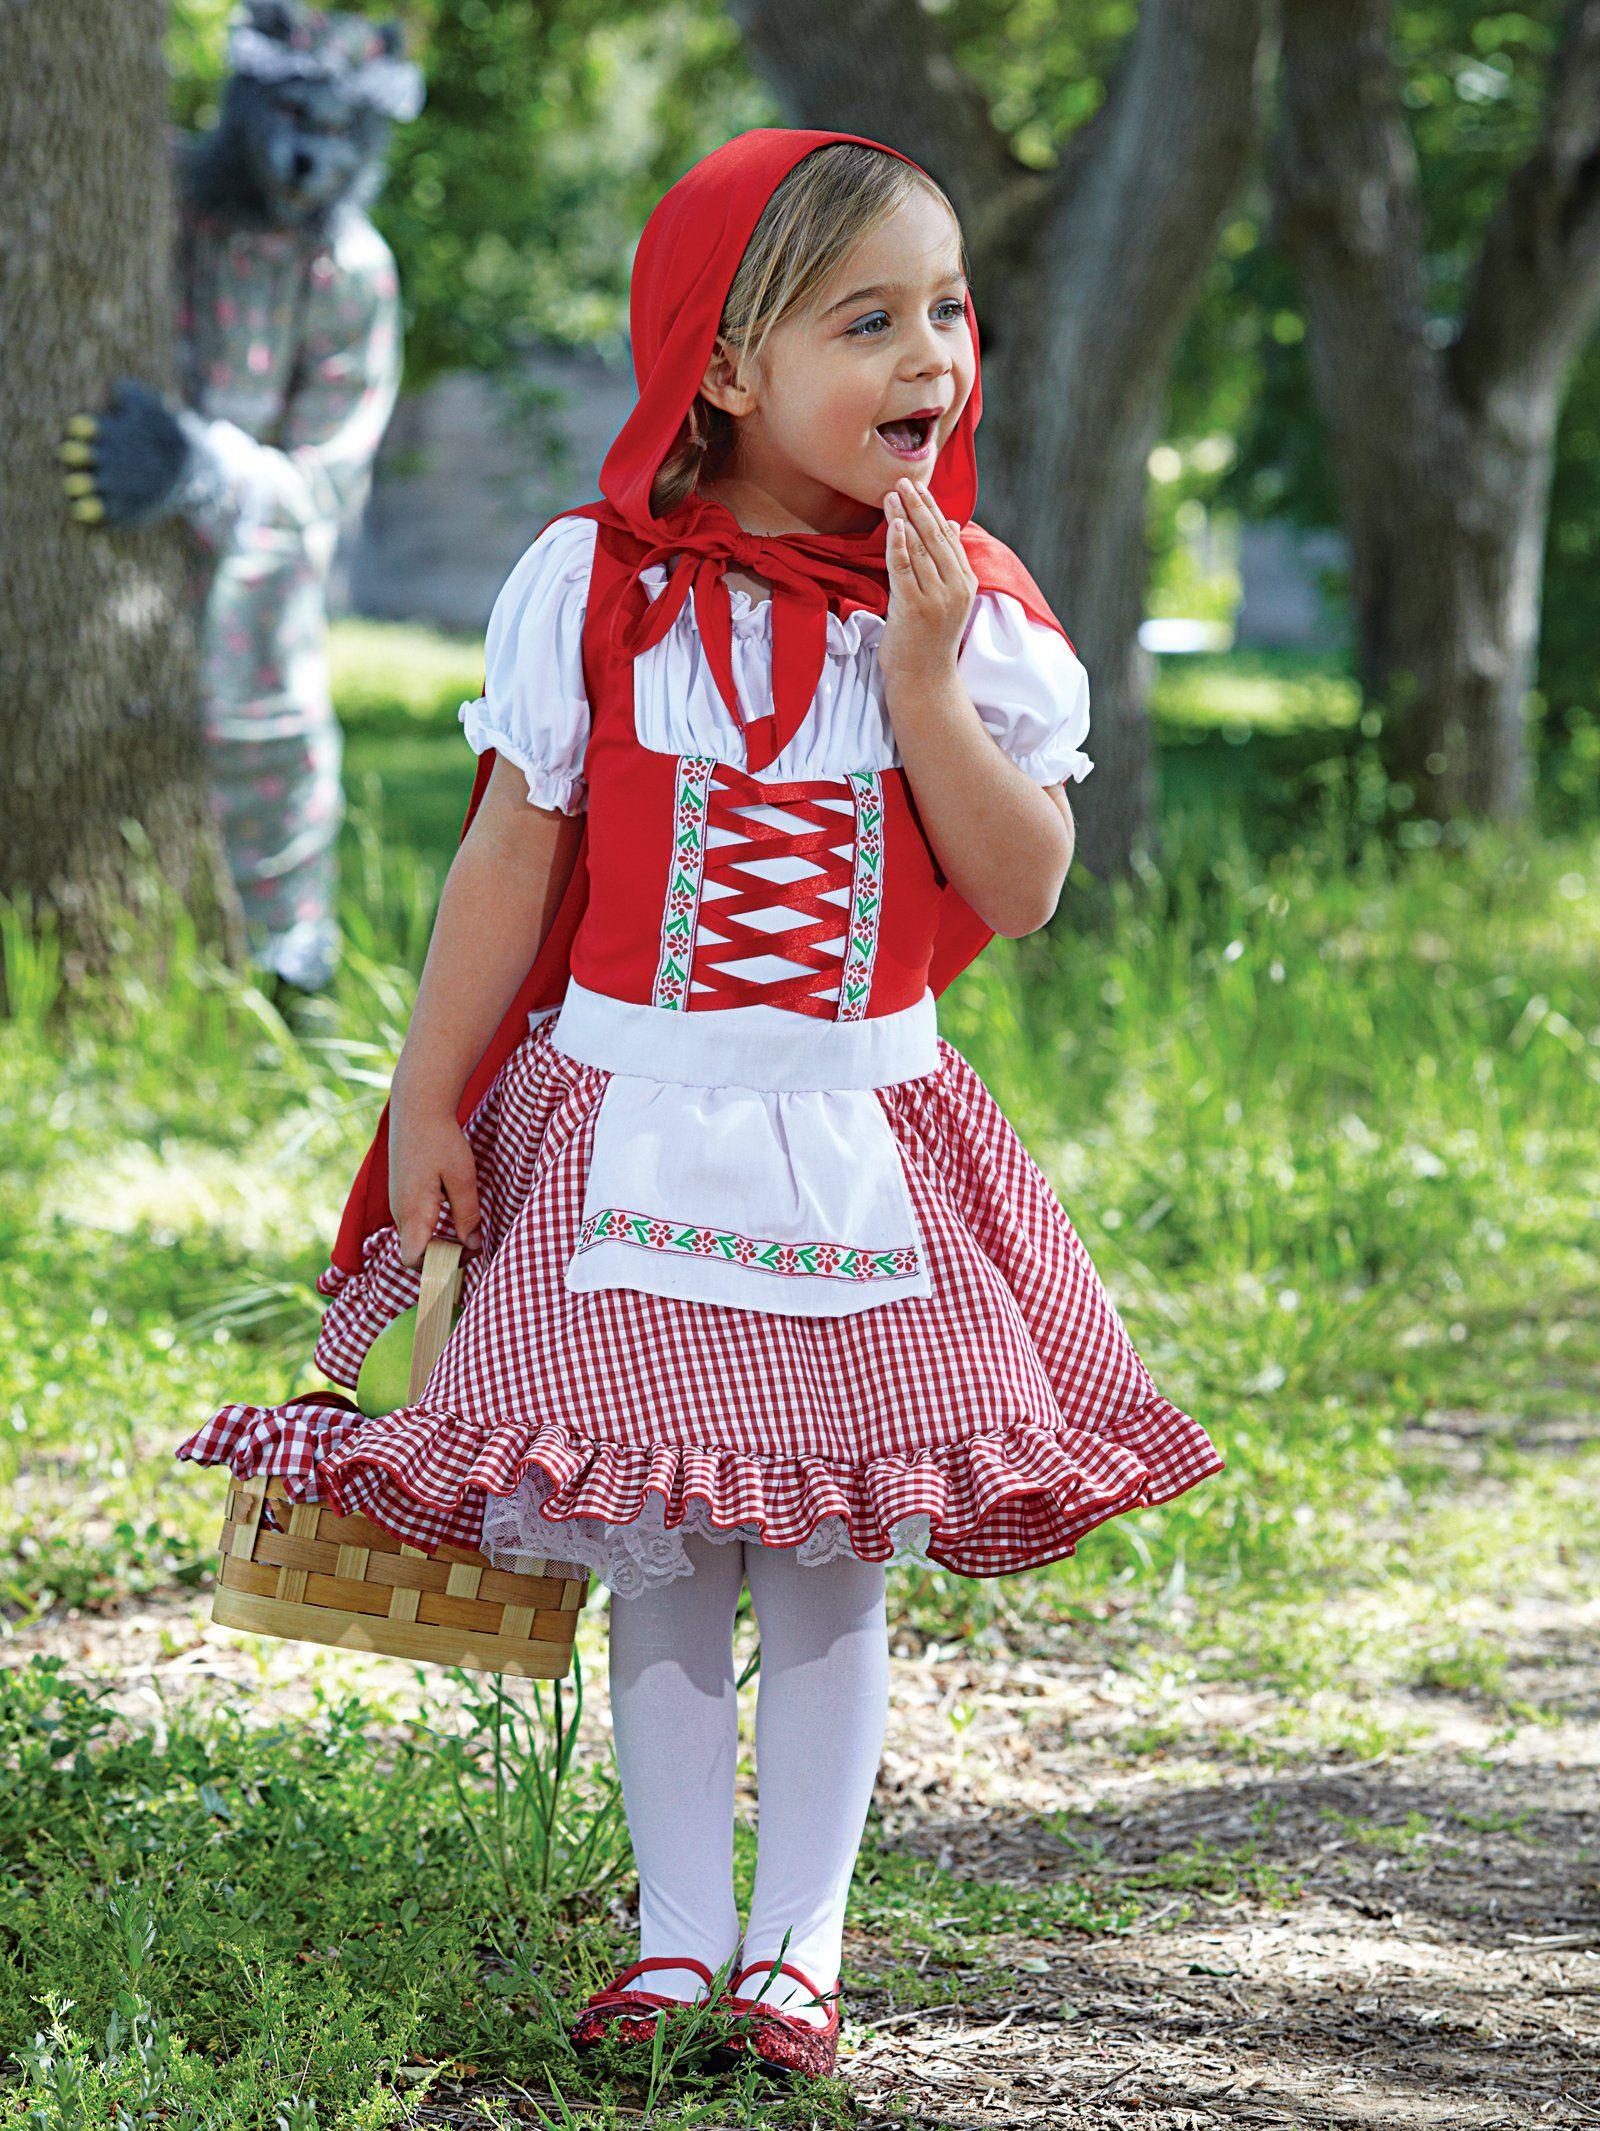 Bijan Kids Royal Prince Dress-Up Set - Toddler & Boys | Toddler ...